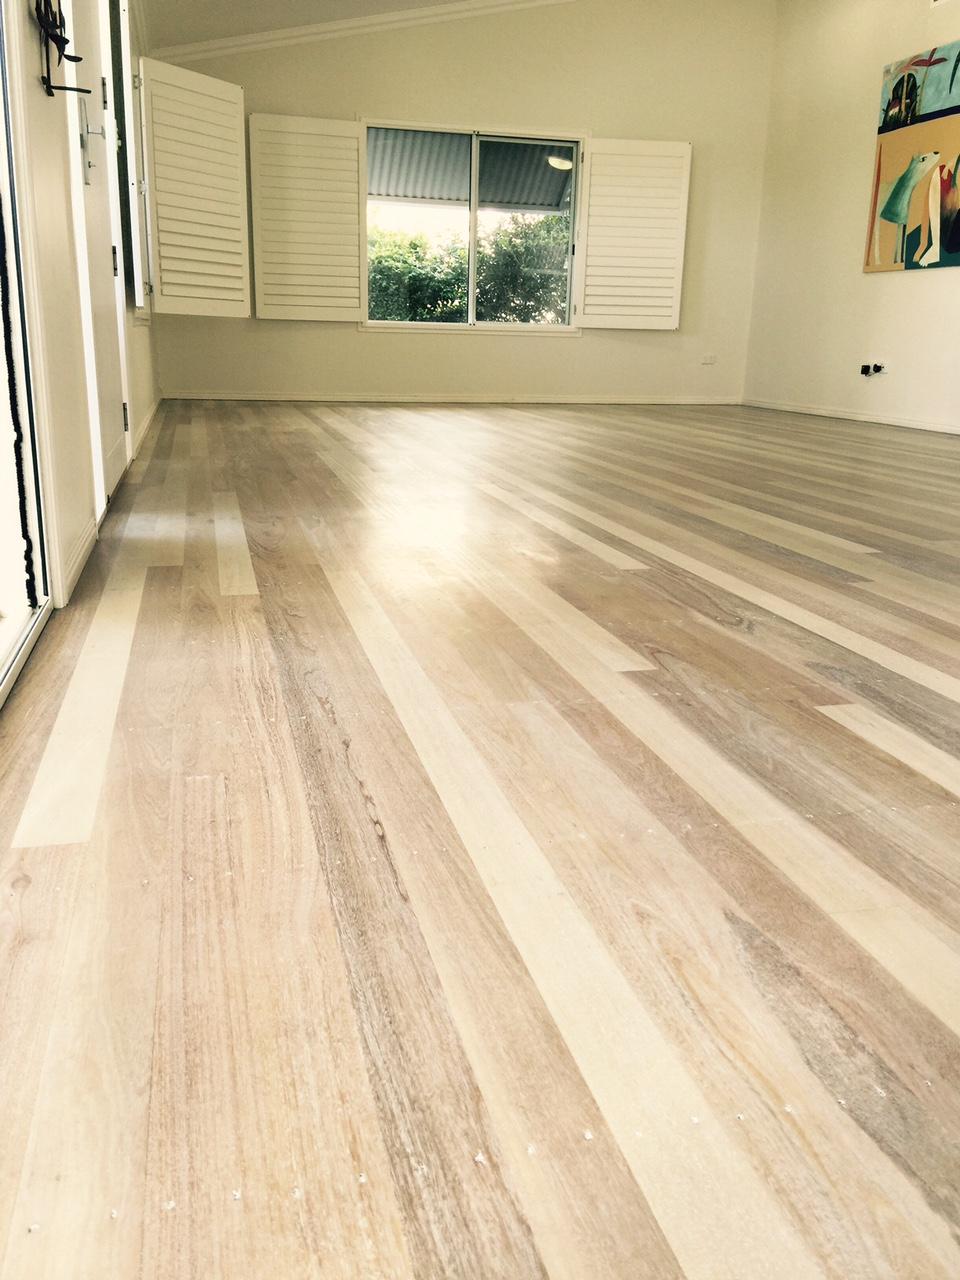 Bleaching wood oak timber flooring for Floors floors floors